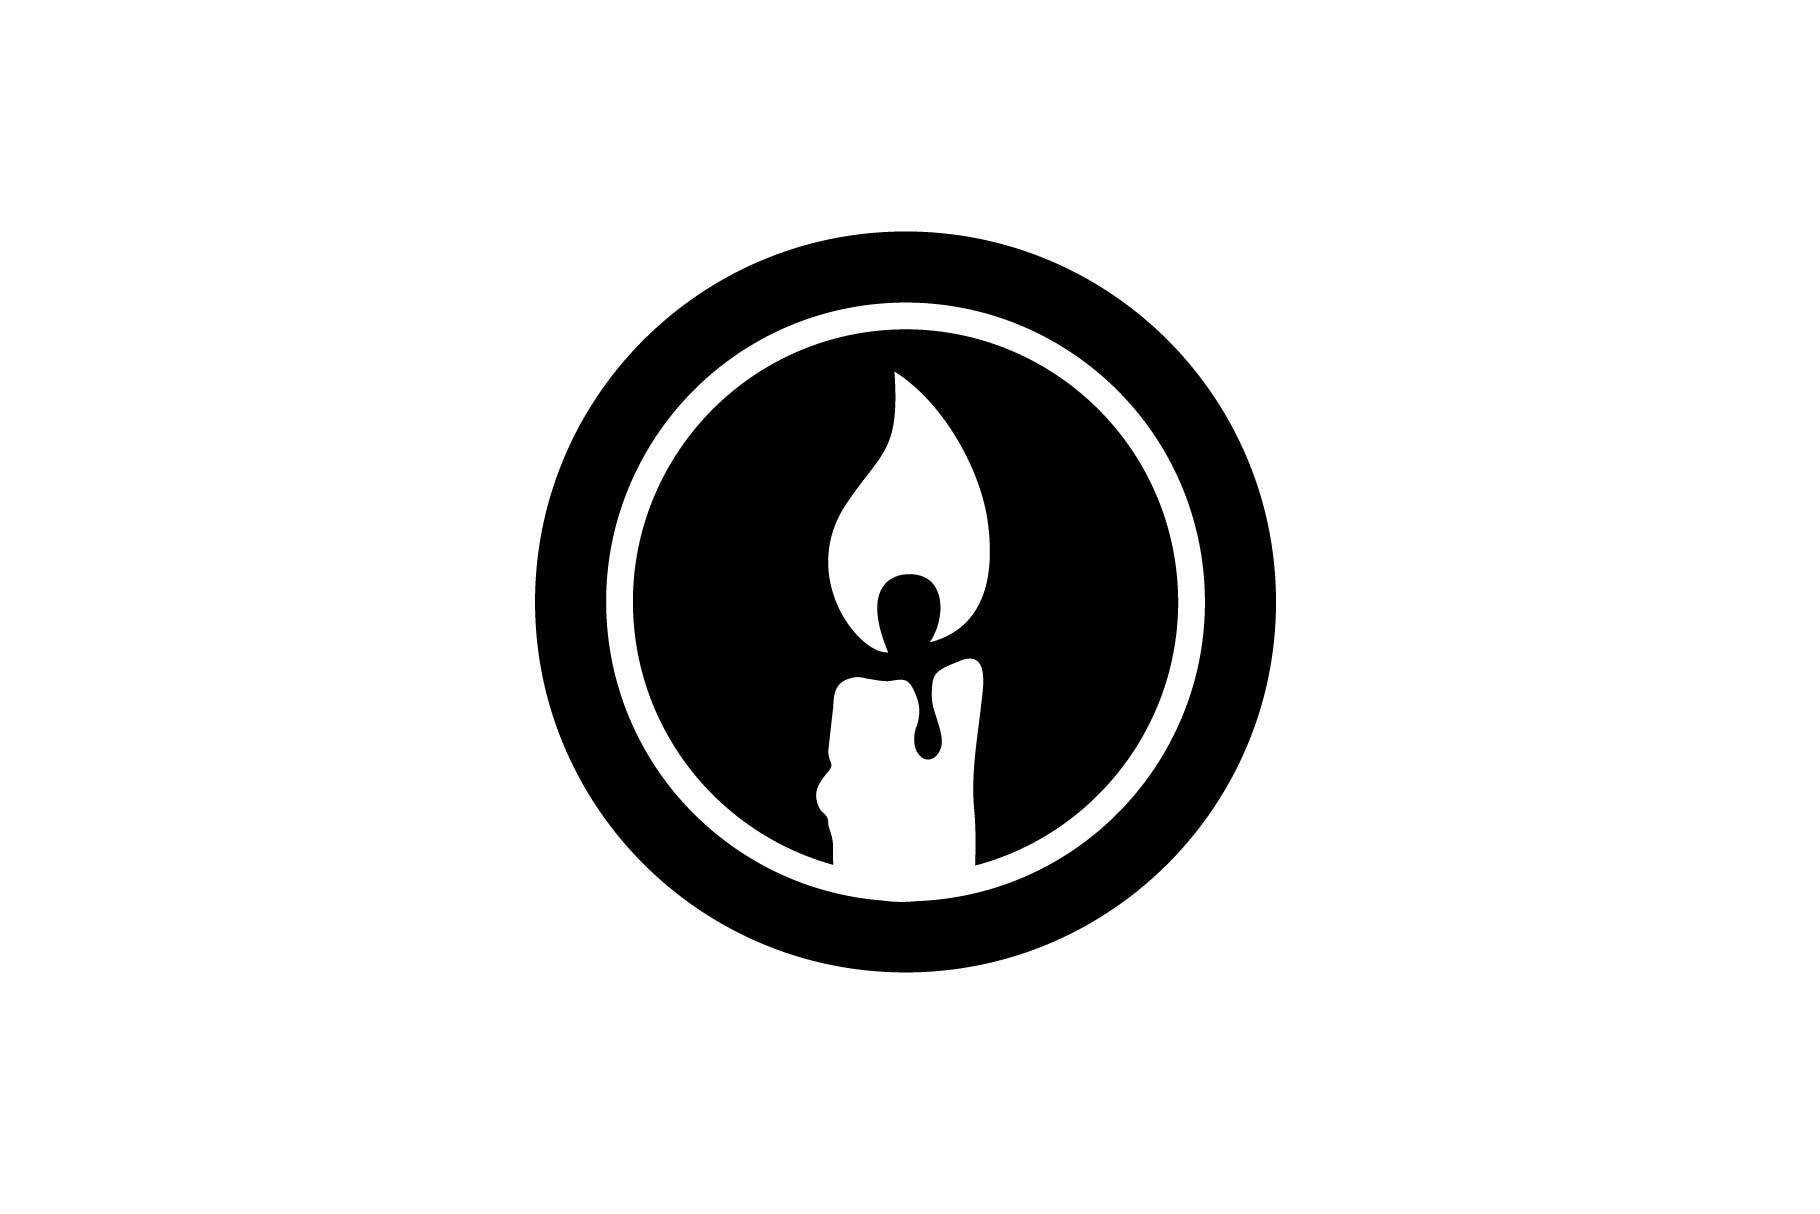 Round circle colorful logo design candle candle Logo colorful flame flowers candle logo round watermark candle candle flame logo